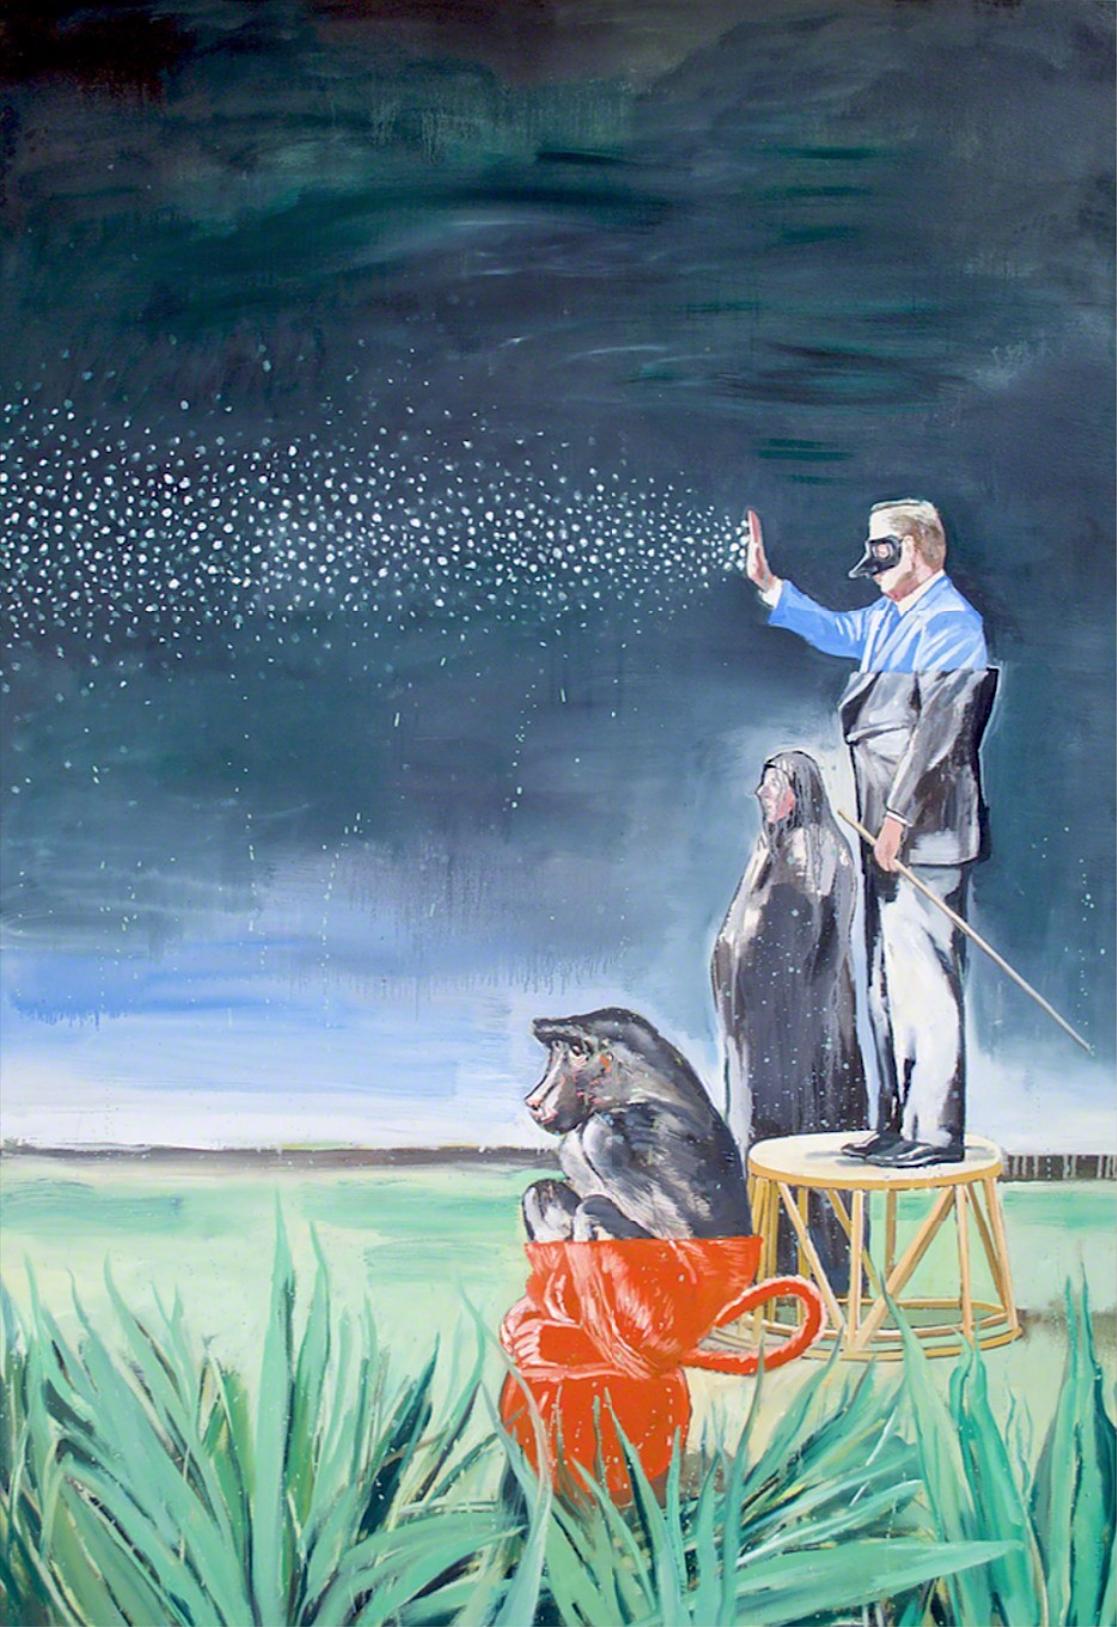 Nicky Nodjoumi, Starry Nights, oil on canvas, 178 x 127 cm, 2003